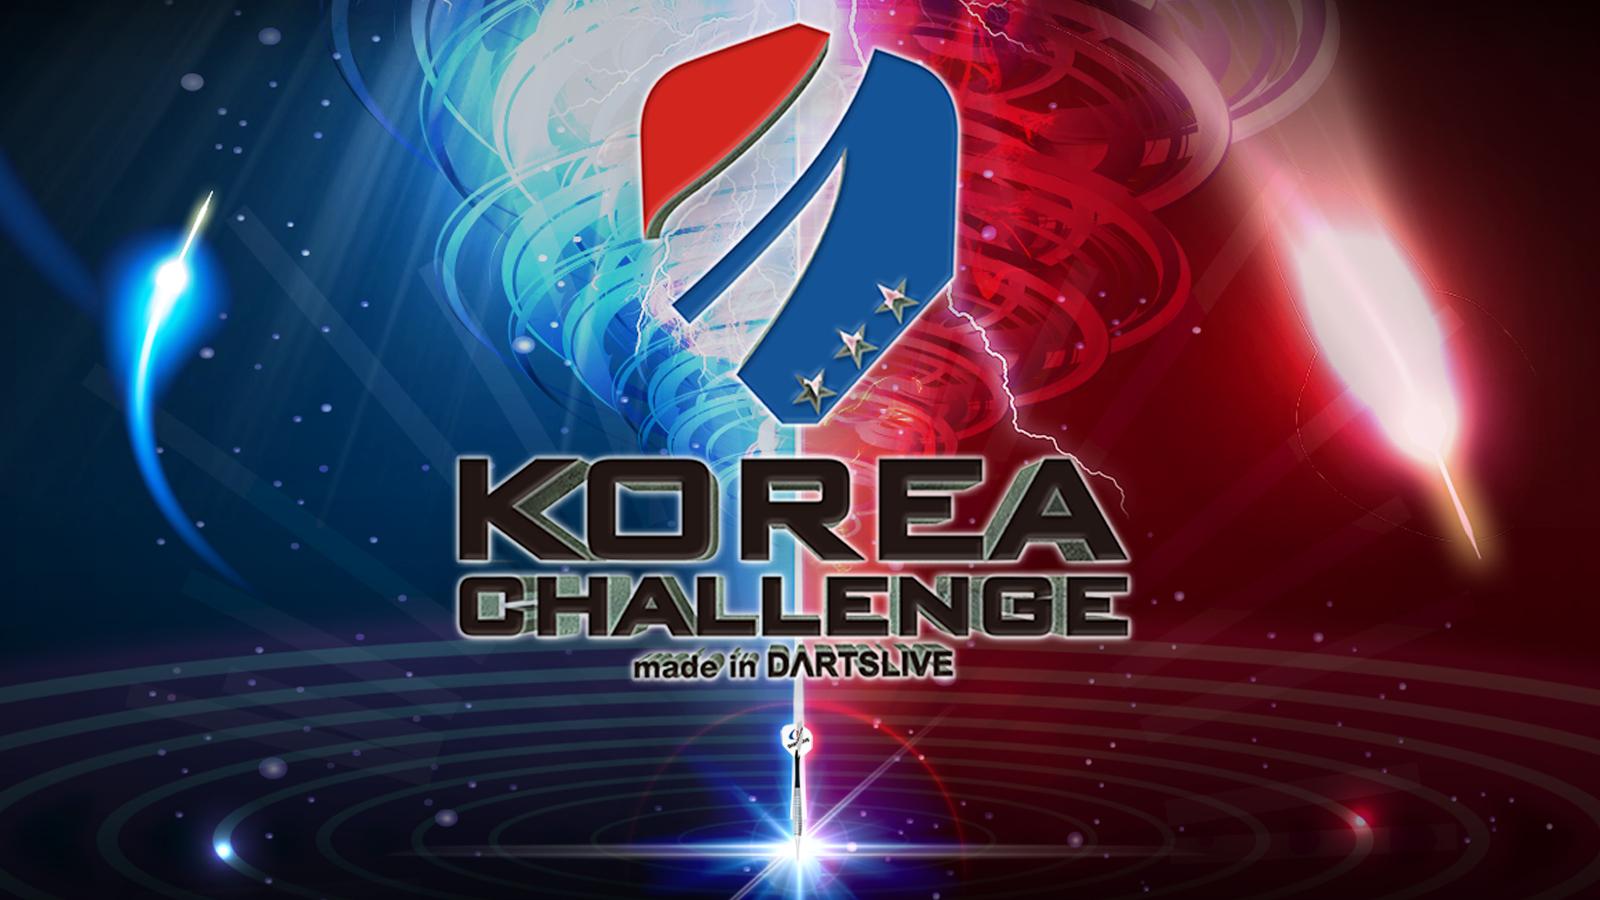 KOREA_CHALLENGE_web_banner.jpg